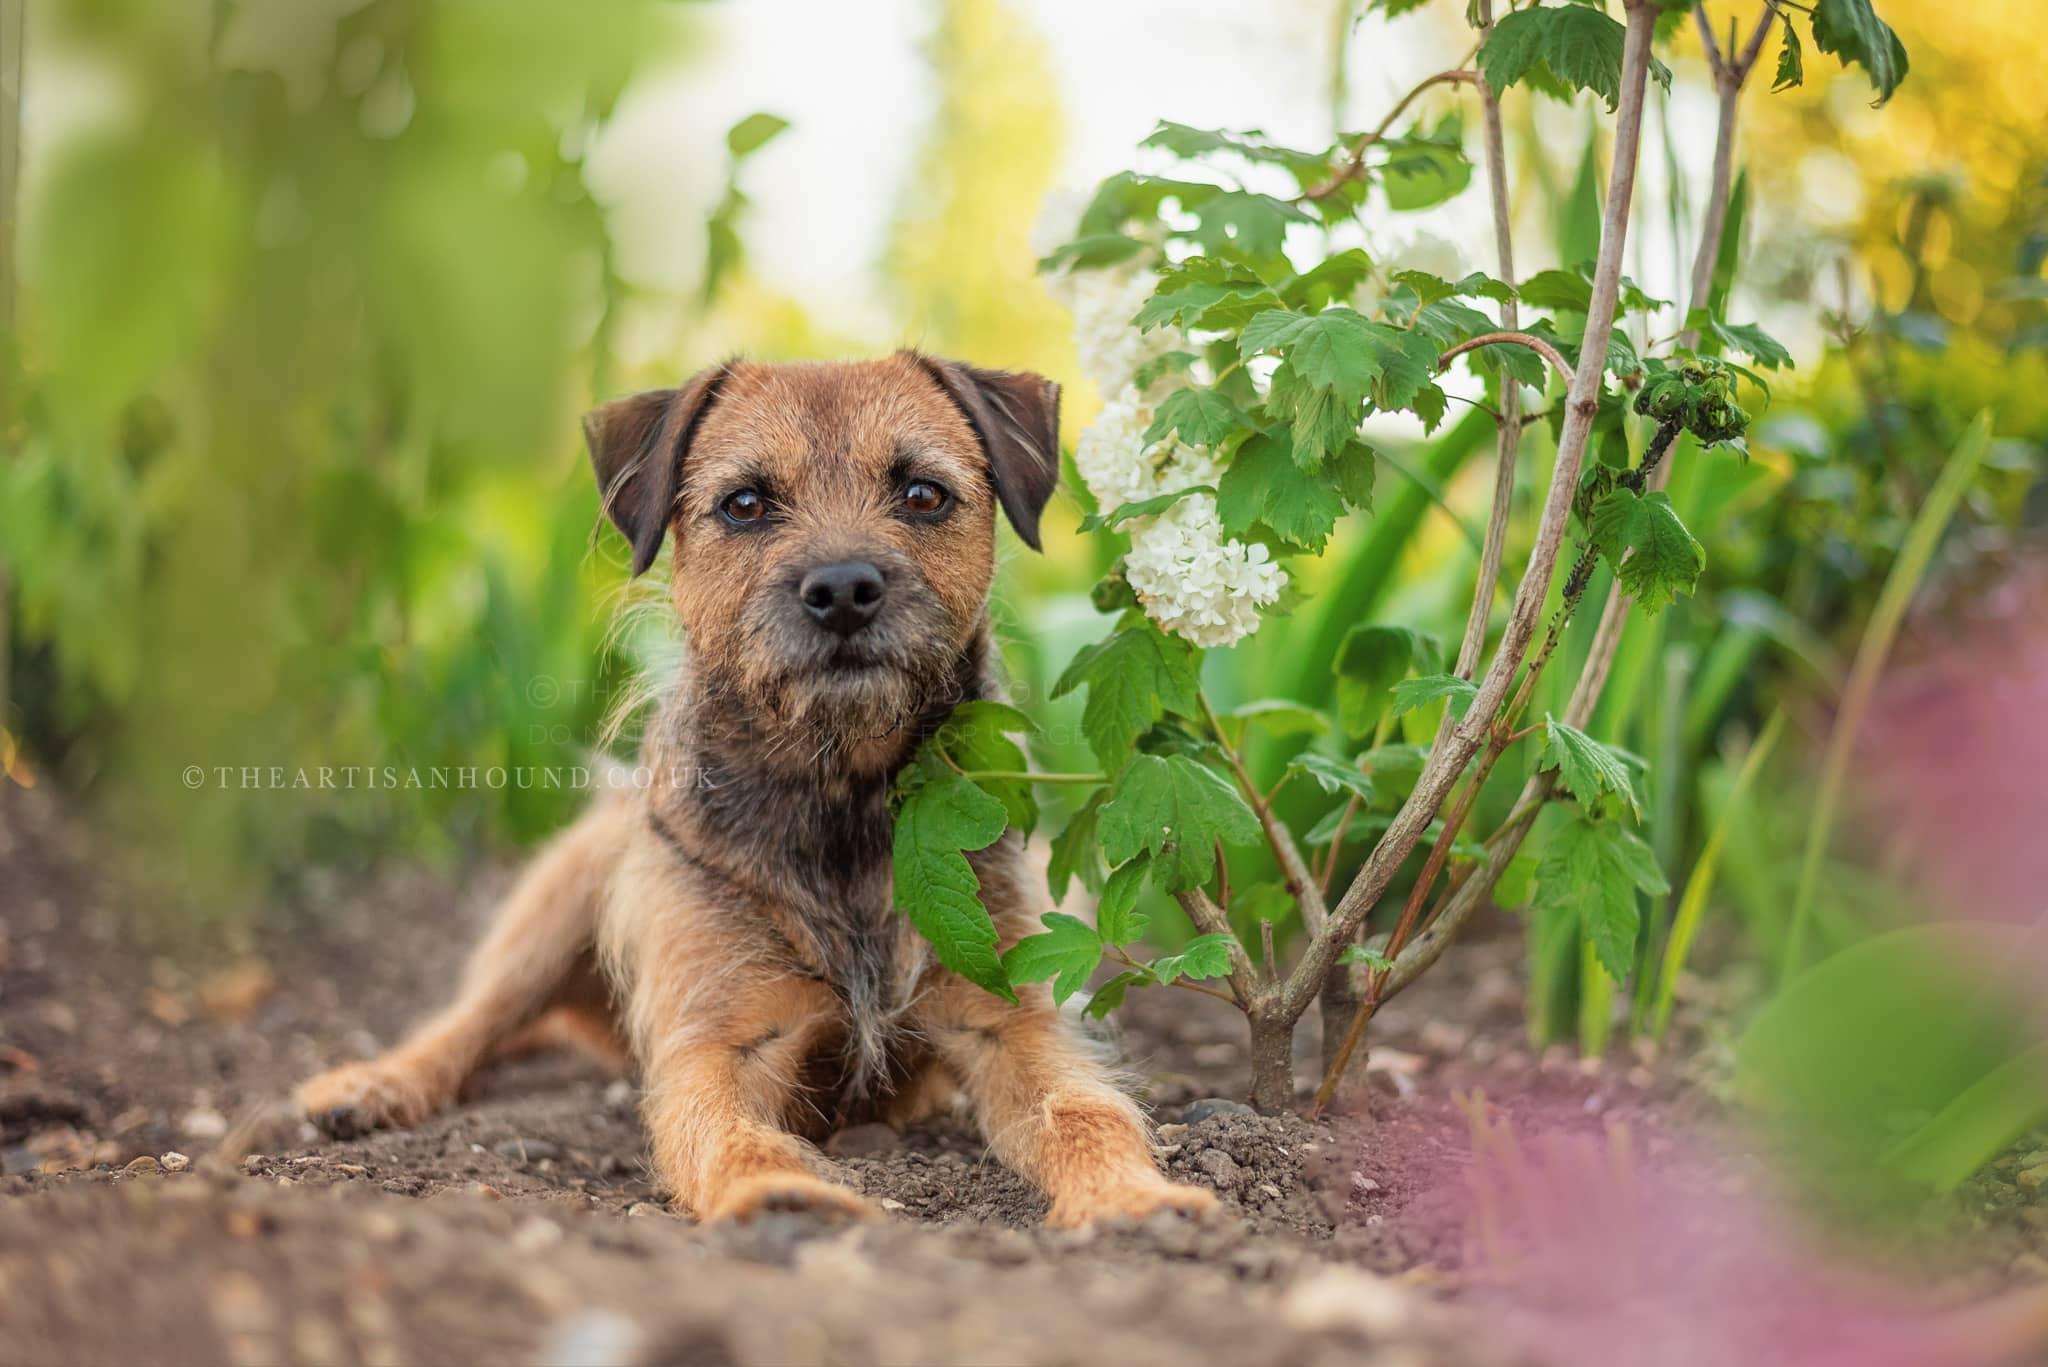 border-terrier-dog-lying-in-flowerbed